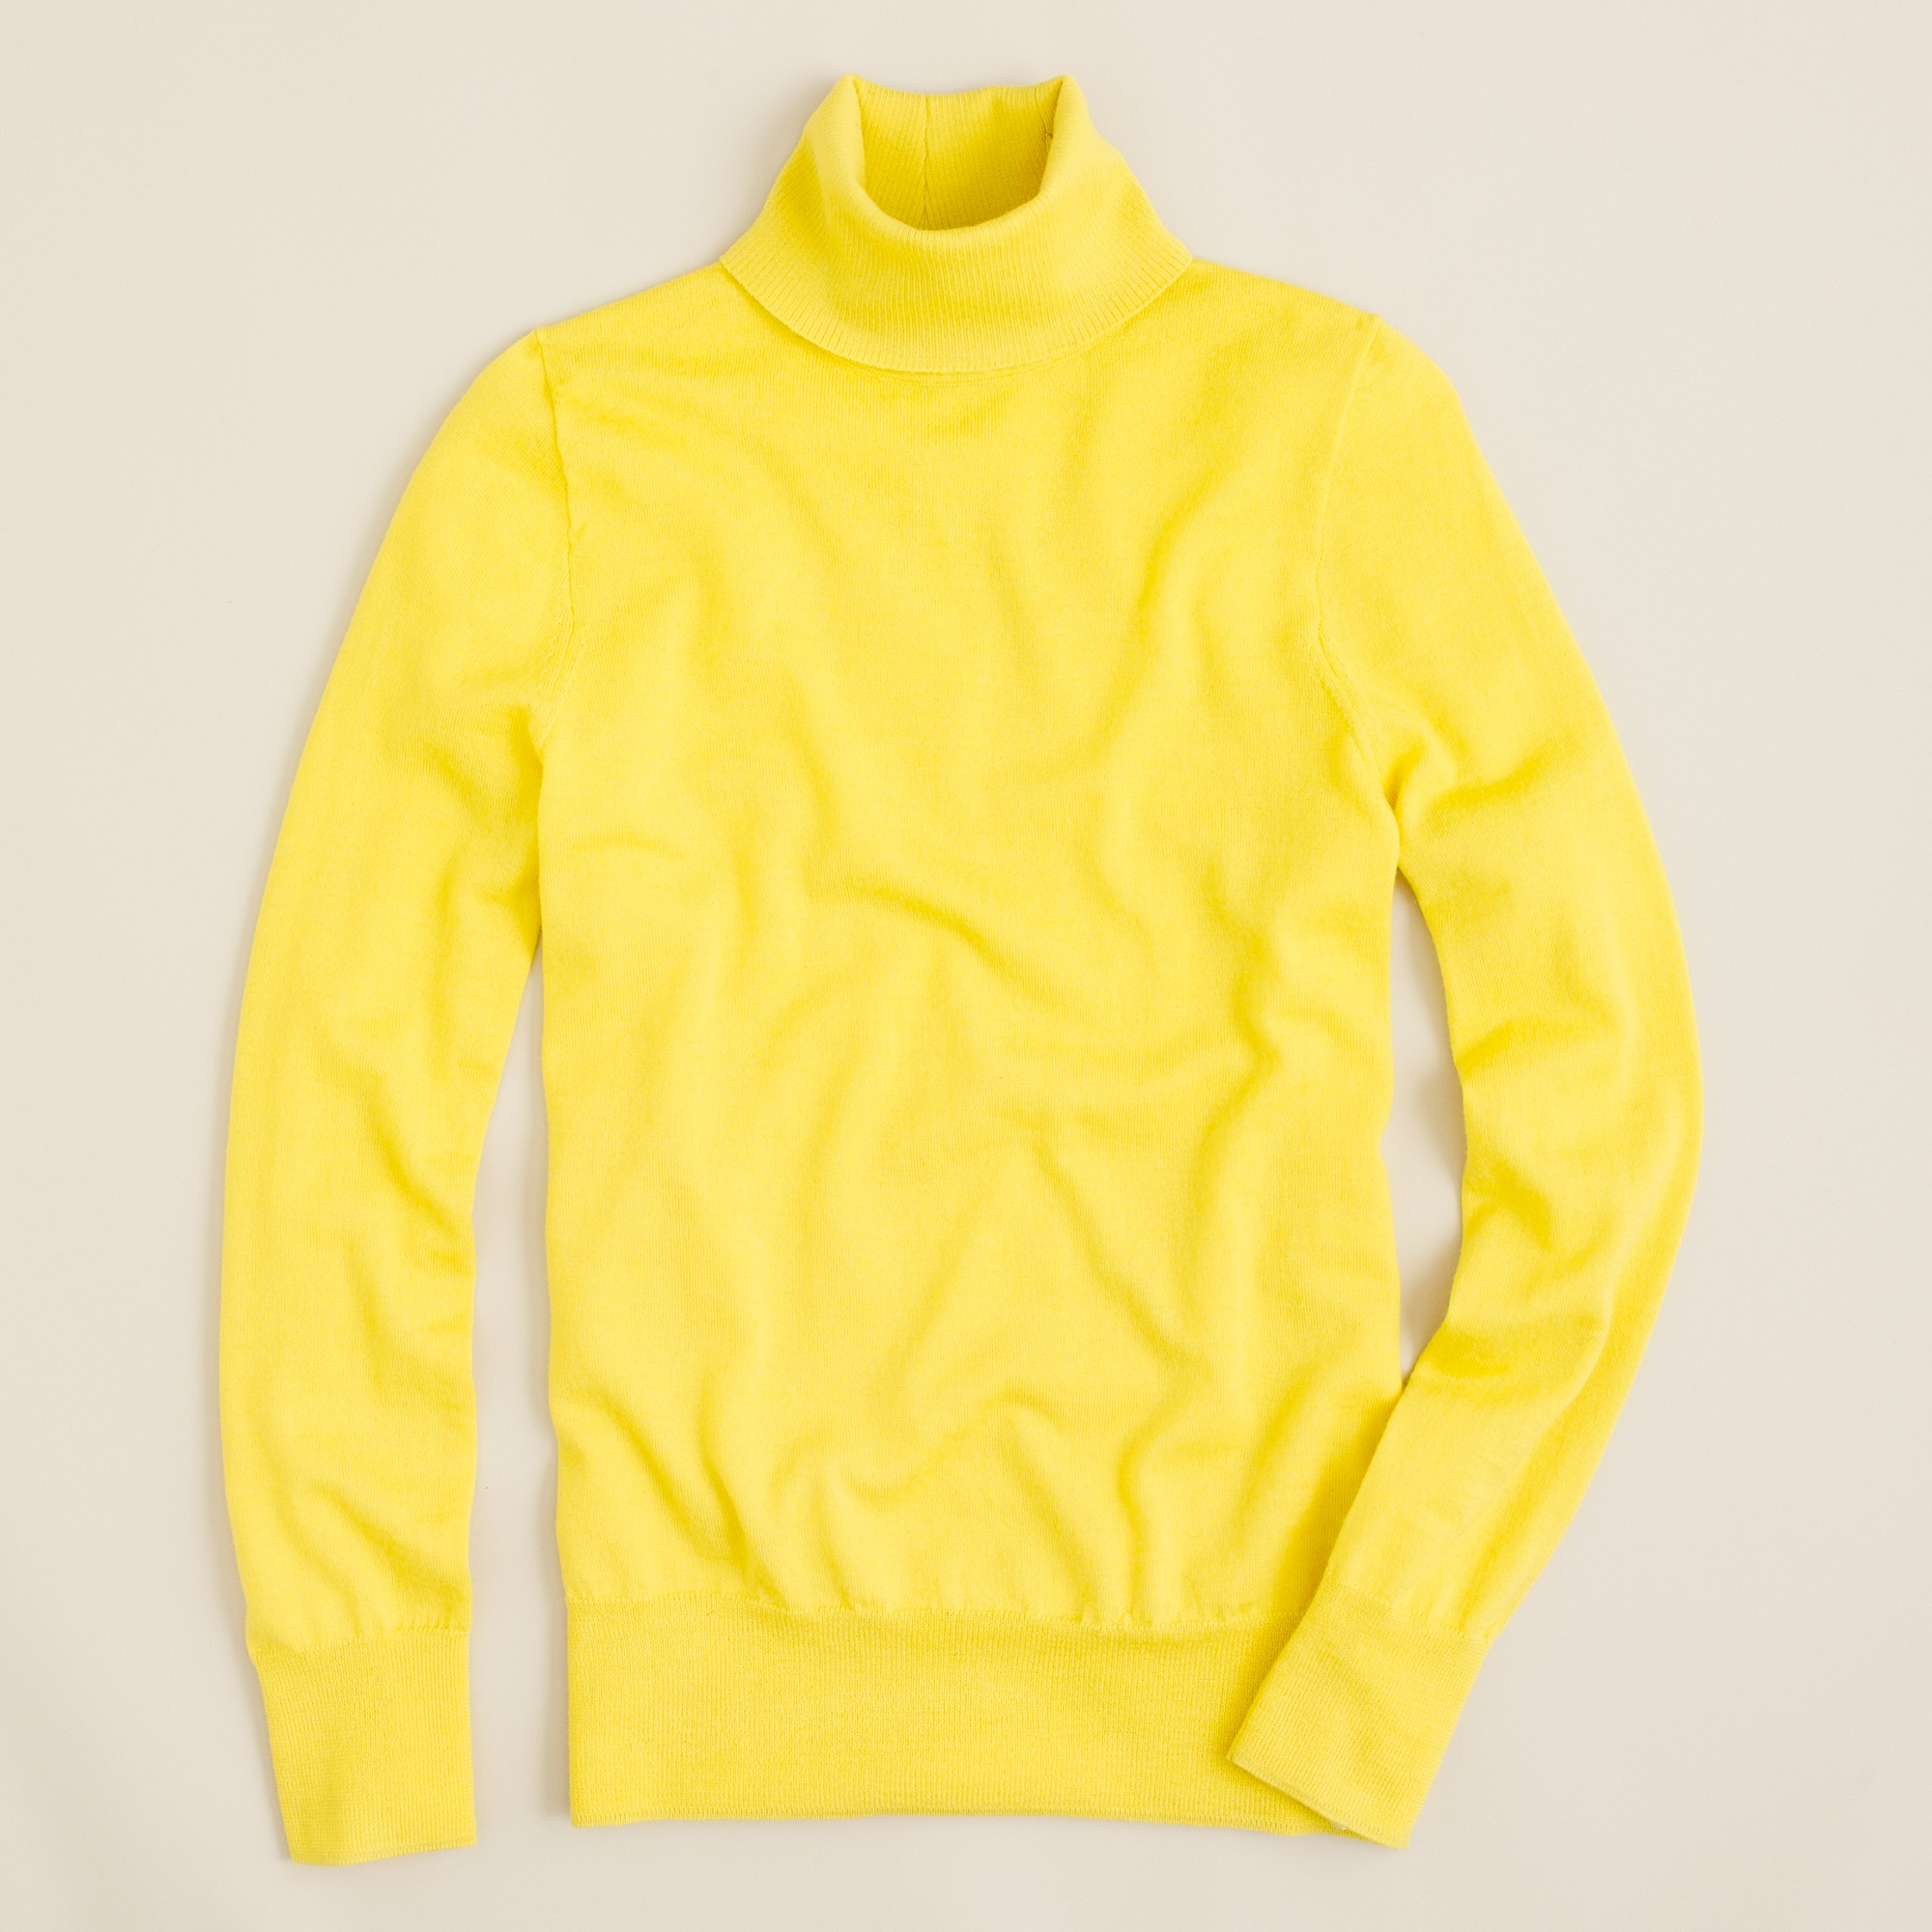 J.crew Merino Turtleneck Sweater in Yellow